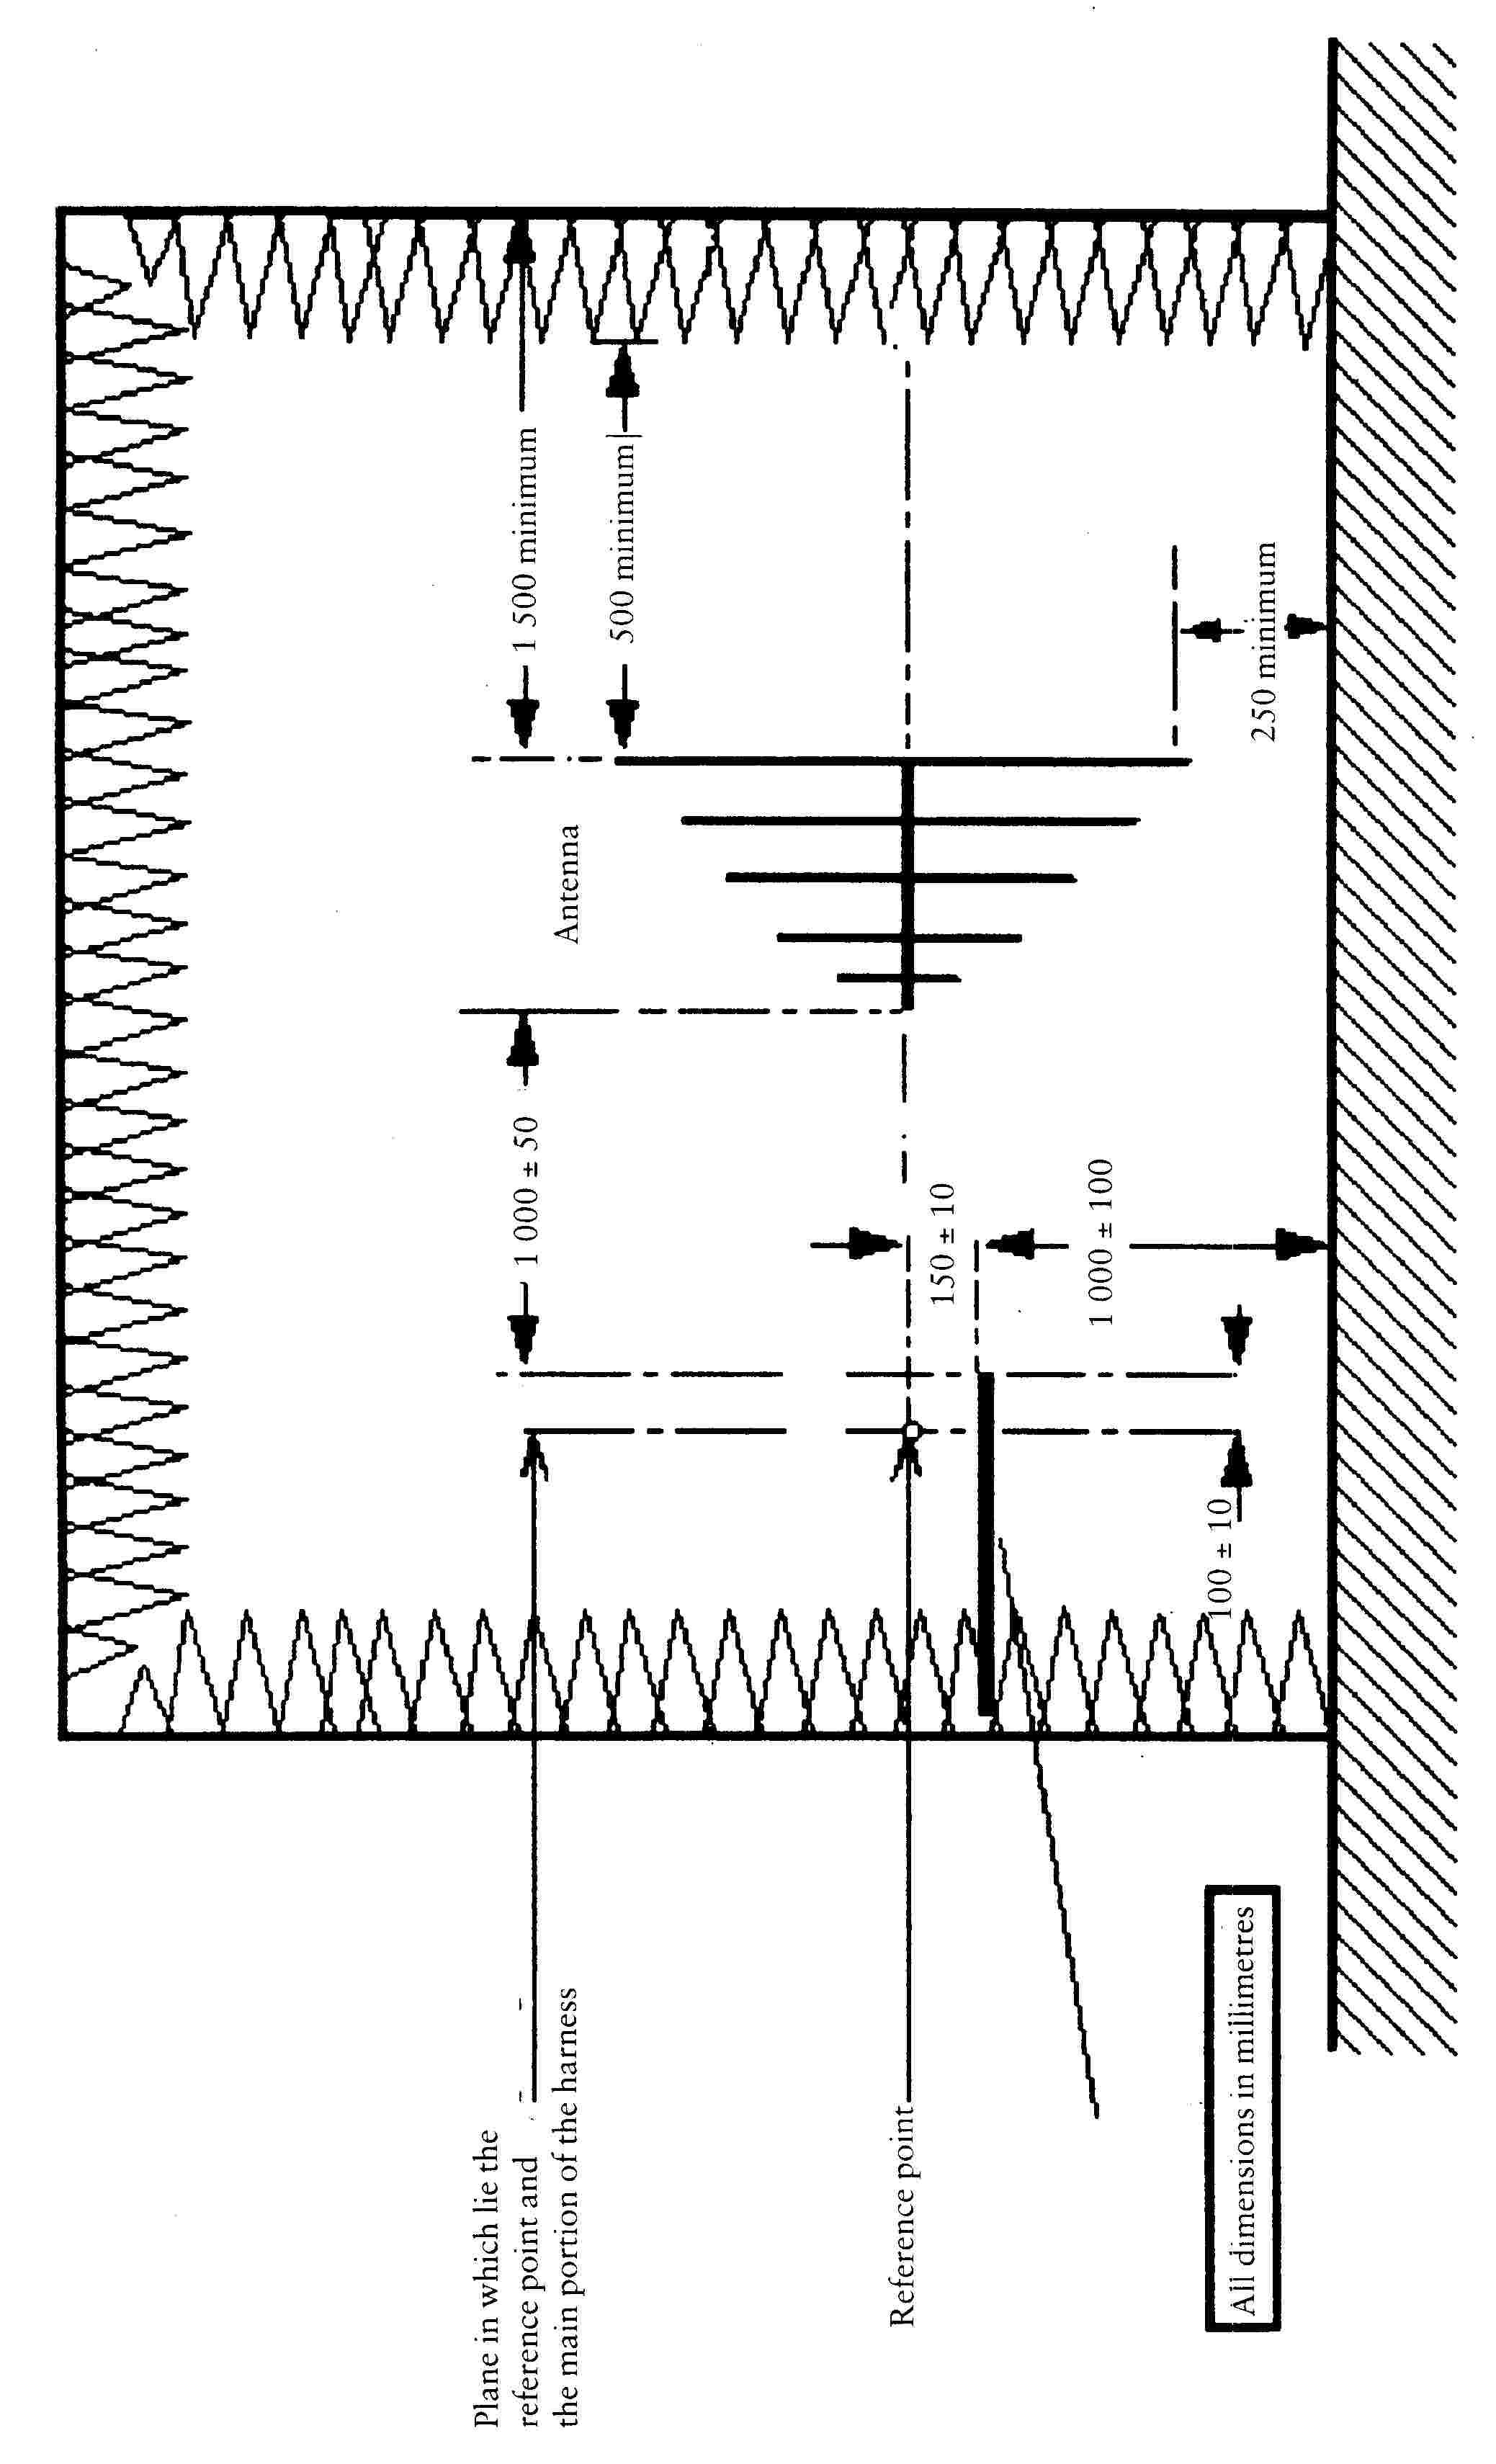 Eur Lex 01975l0322 20070101 En Power Supply Positivenegativeground From A Single Image